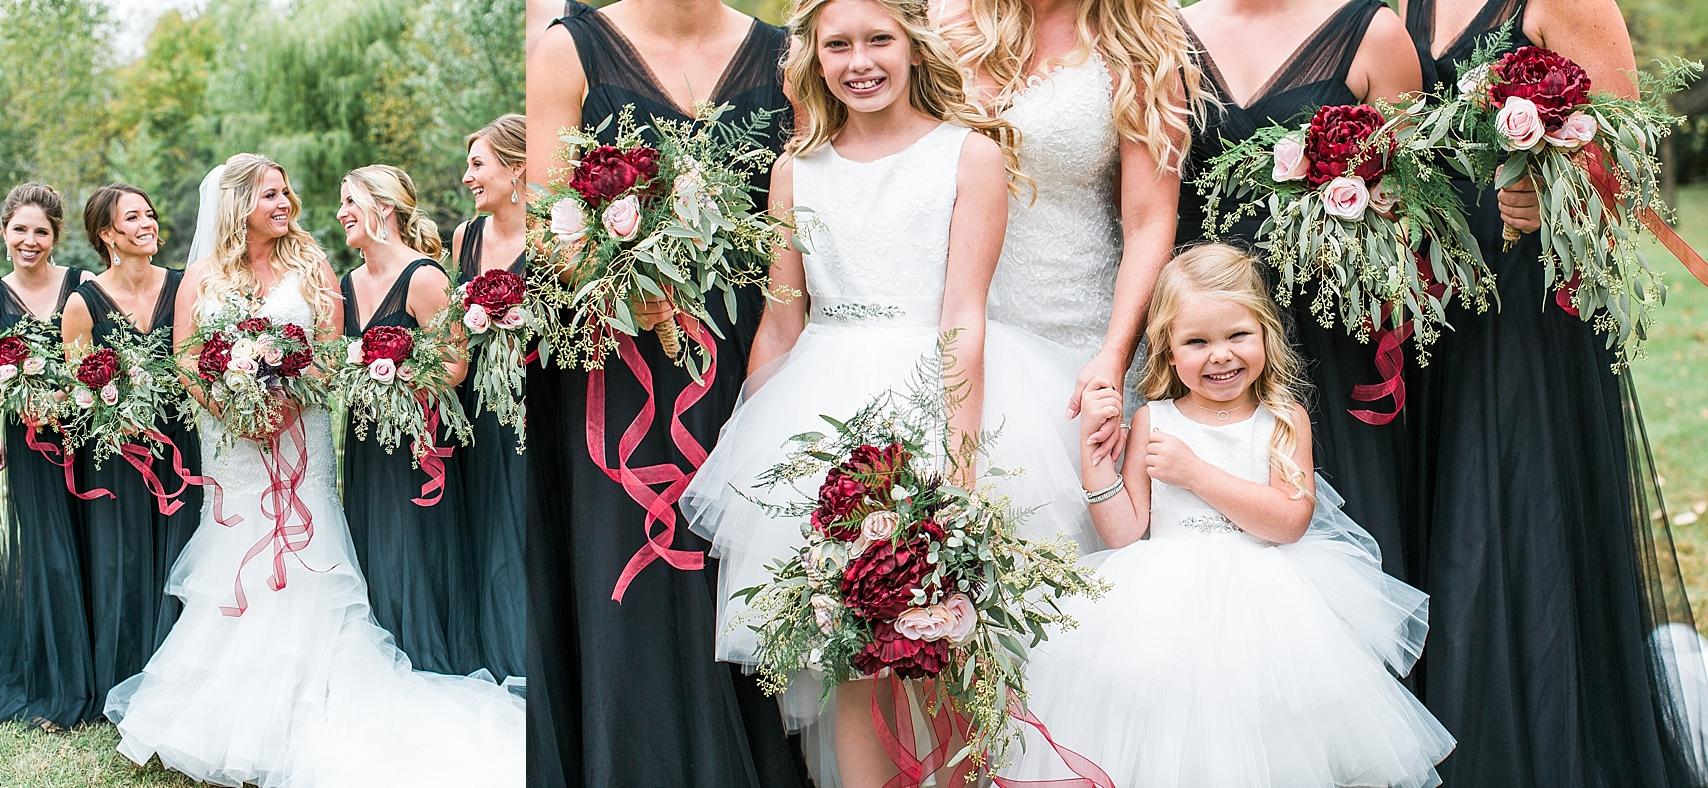 Minnesota Minneapolis Wedding Photographer Best Of 2018 Weddings Mallory Kiesow Photography_0201.jpg